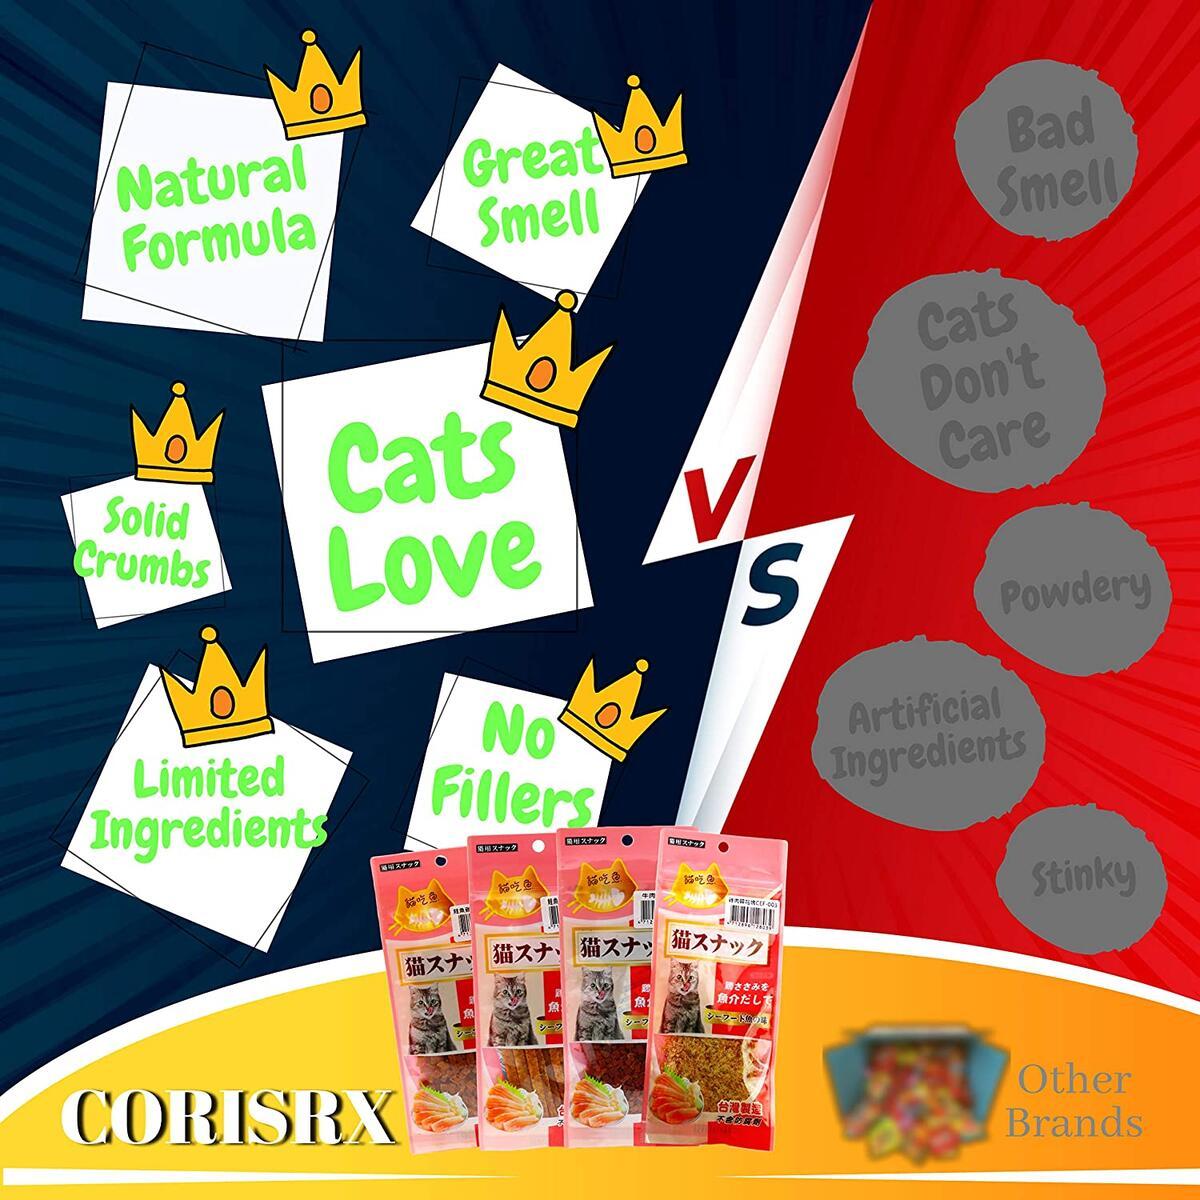 Corisrx Cat Treats Soft Food - Real Meat Grain Free Treats for Cat - Limited Ingredient Cat Snacks - Kitten Training Treats 1.02oz3 (Salmon Chicken Crumbs, Shreds, Lean beef Crumbs)